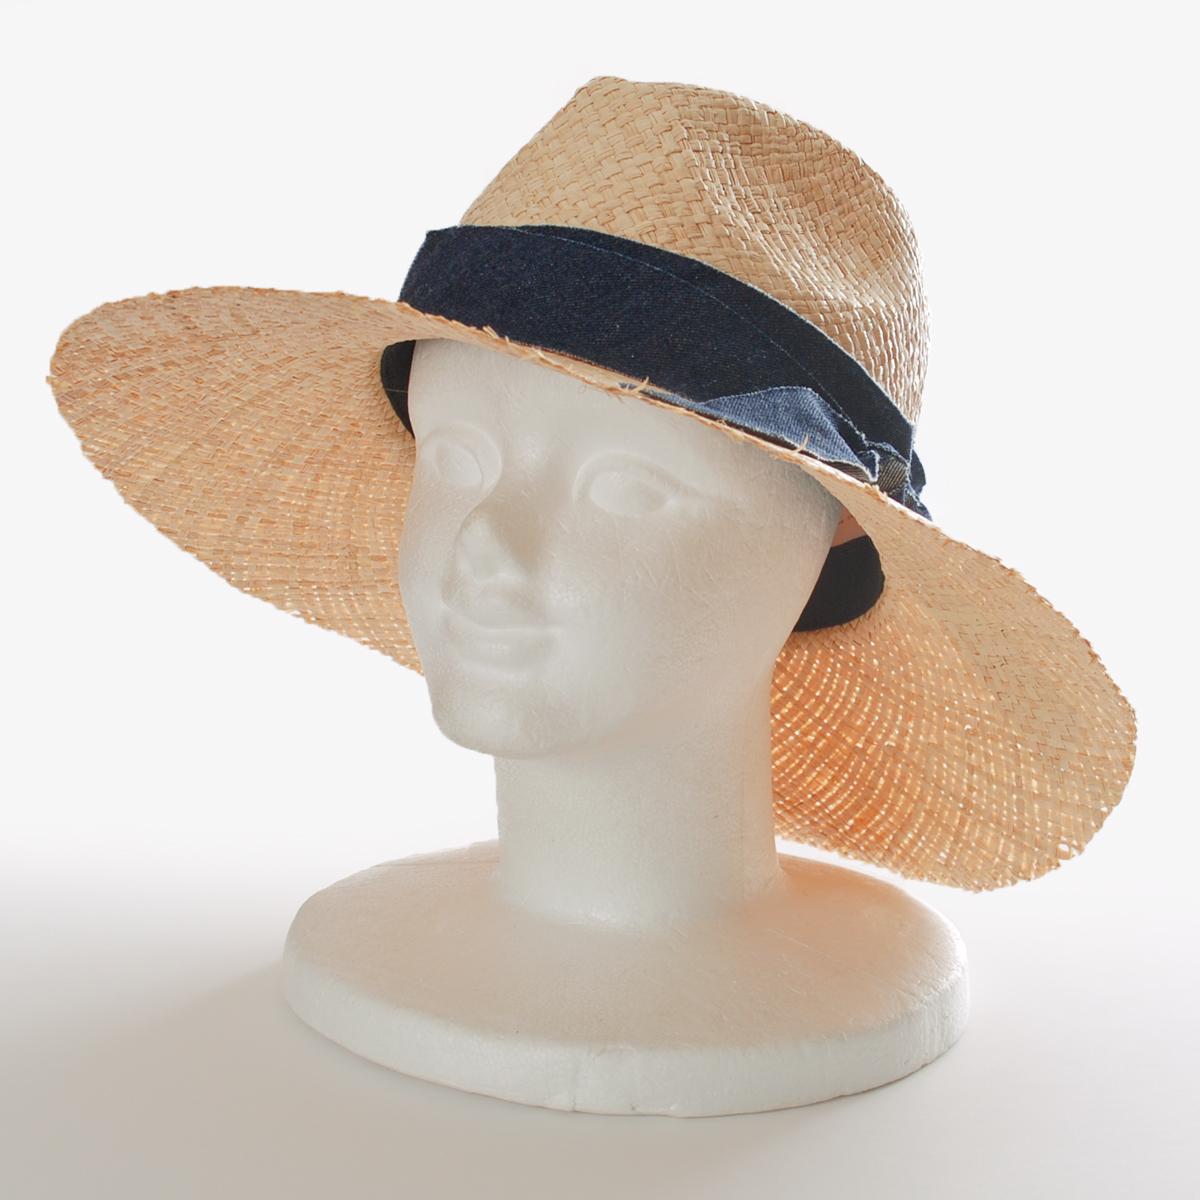 K-STYLE outlet hat  Denim ribbon raffia broad-brimmed hat  dfac947cb